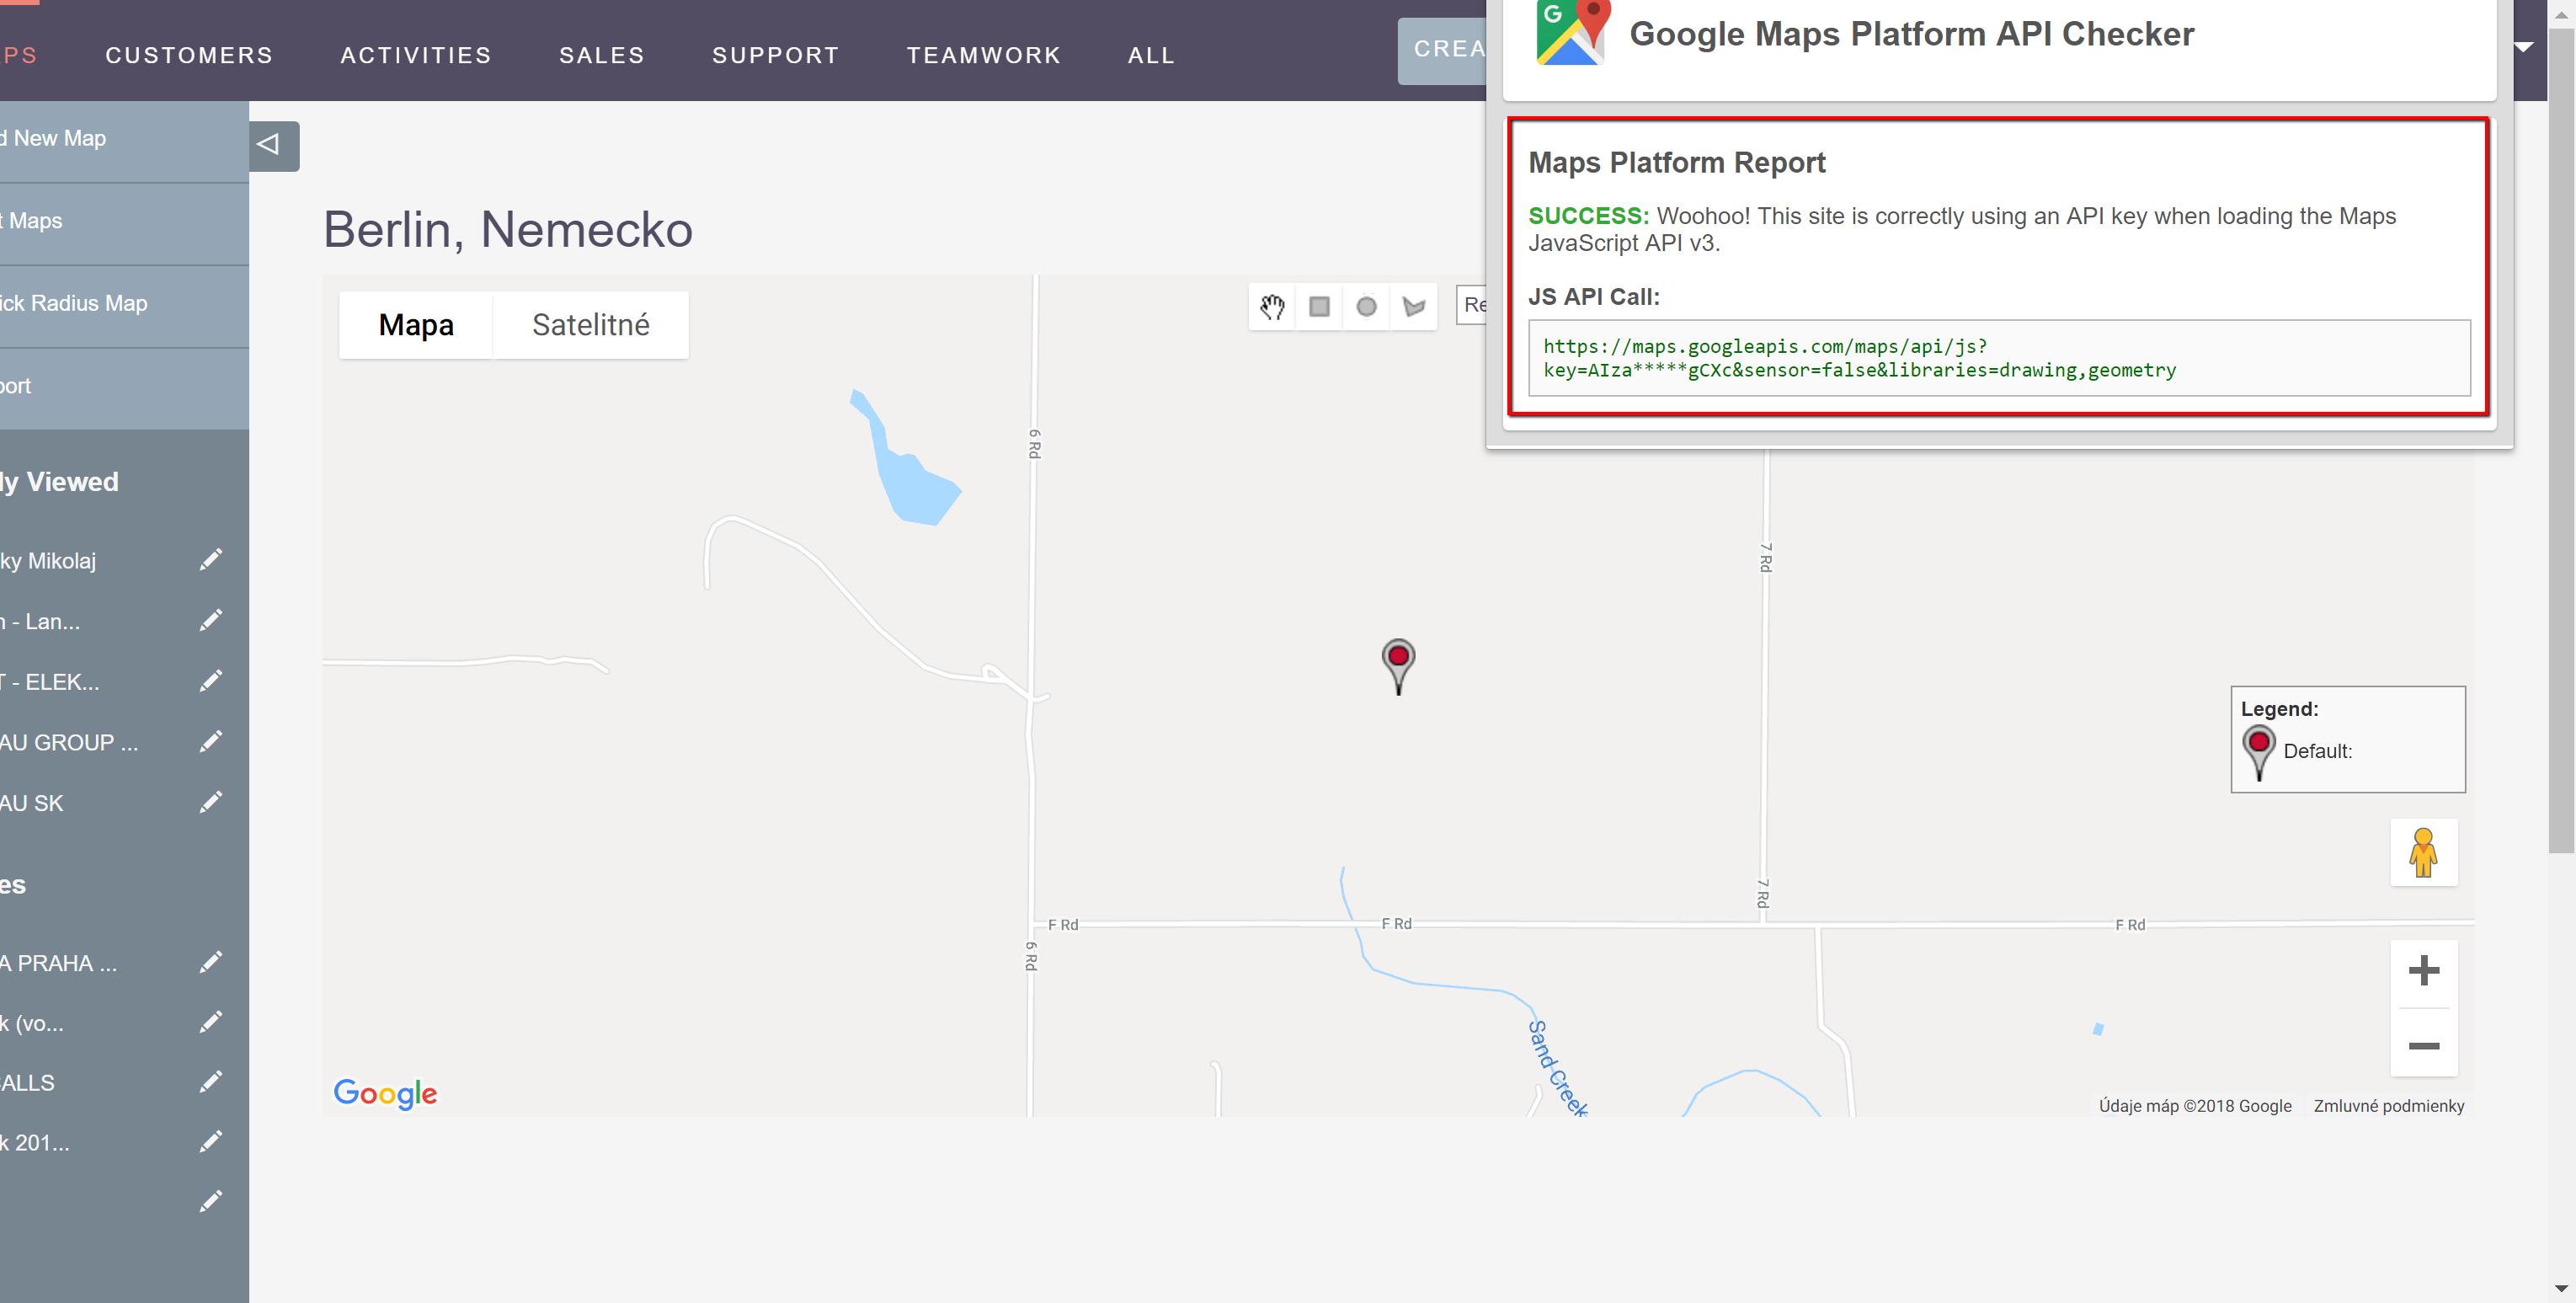 Quick radius map + Geocode test issue · Issue #6326 ... on area code directory map, google map, germany map, geodesic map, longitude map, casino map, cartogram map, hospital map, globe map, geochronology map, mobile map,